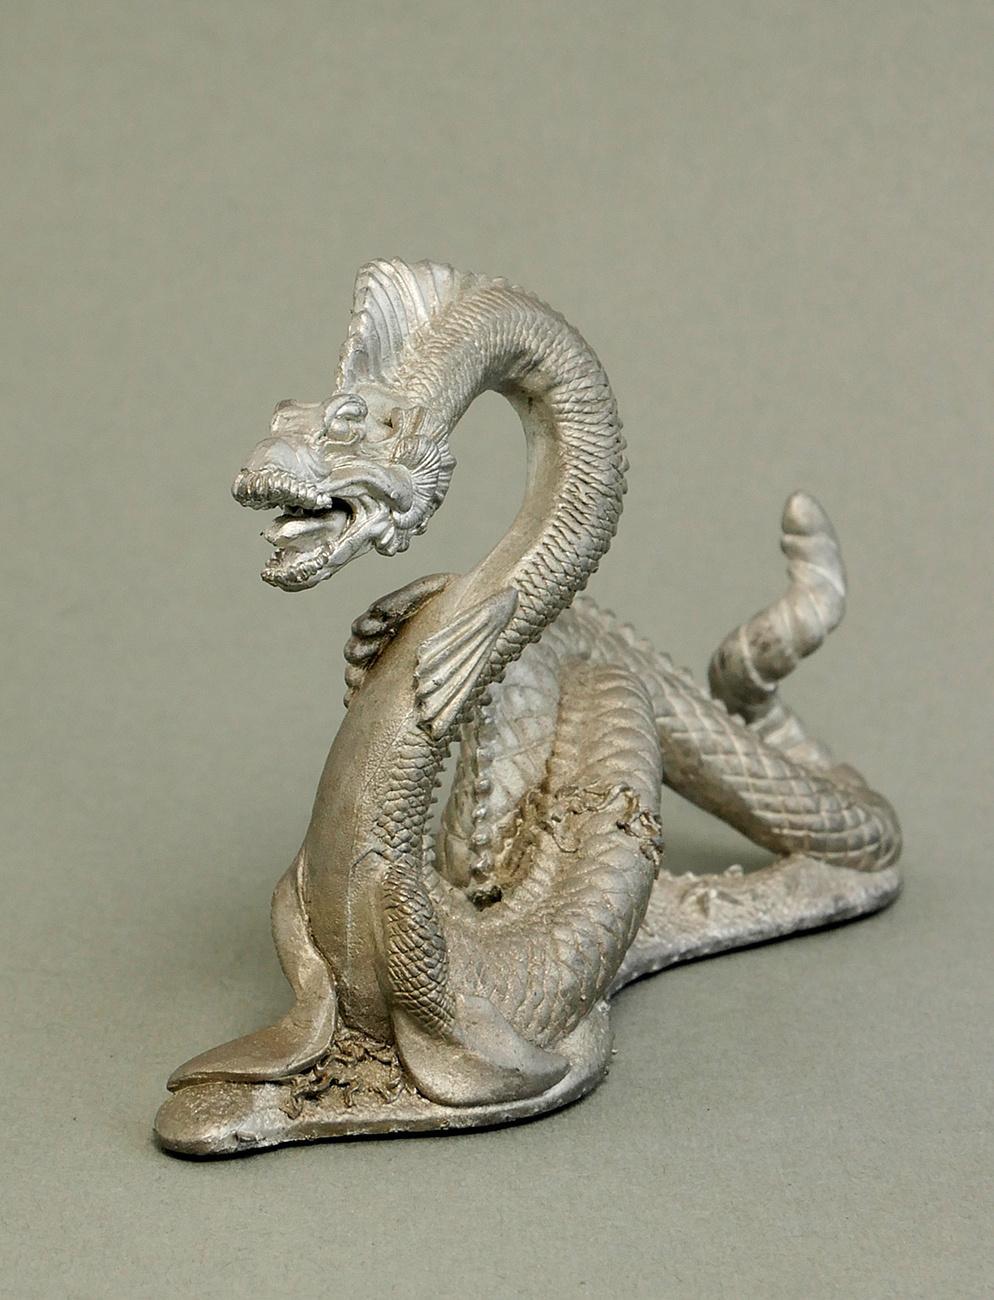 Dragon, Grenadier, Grenadier Miniatures, John Dennett, Sea Dragon